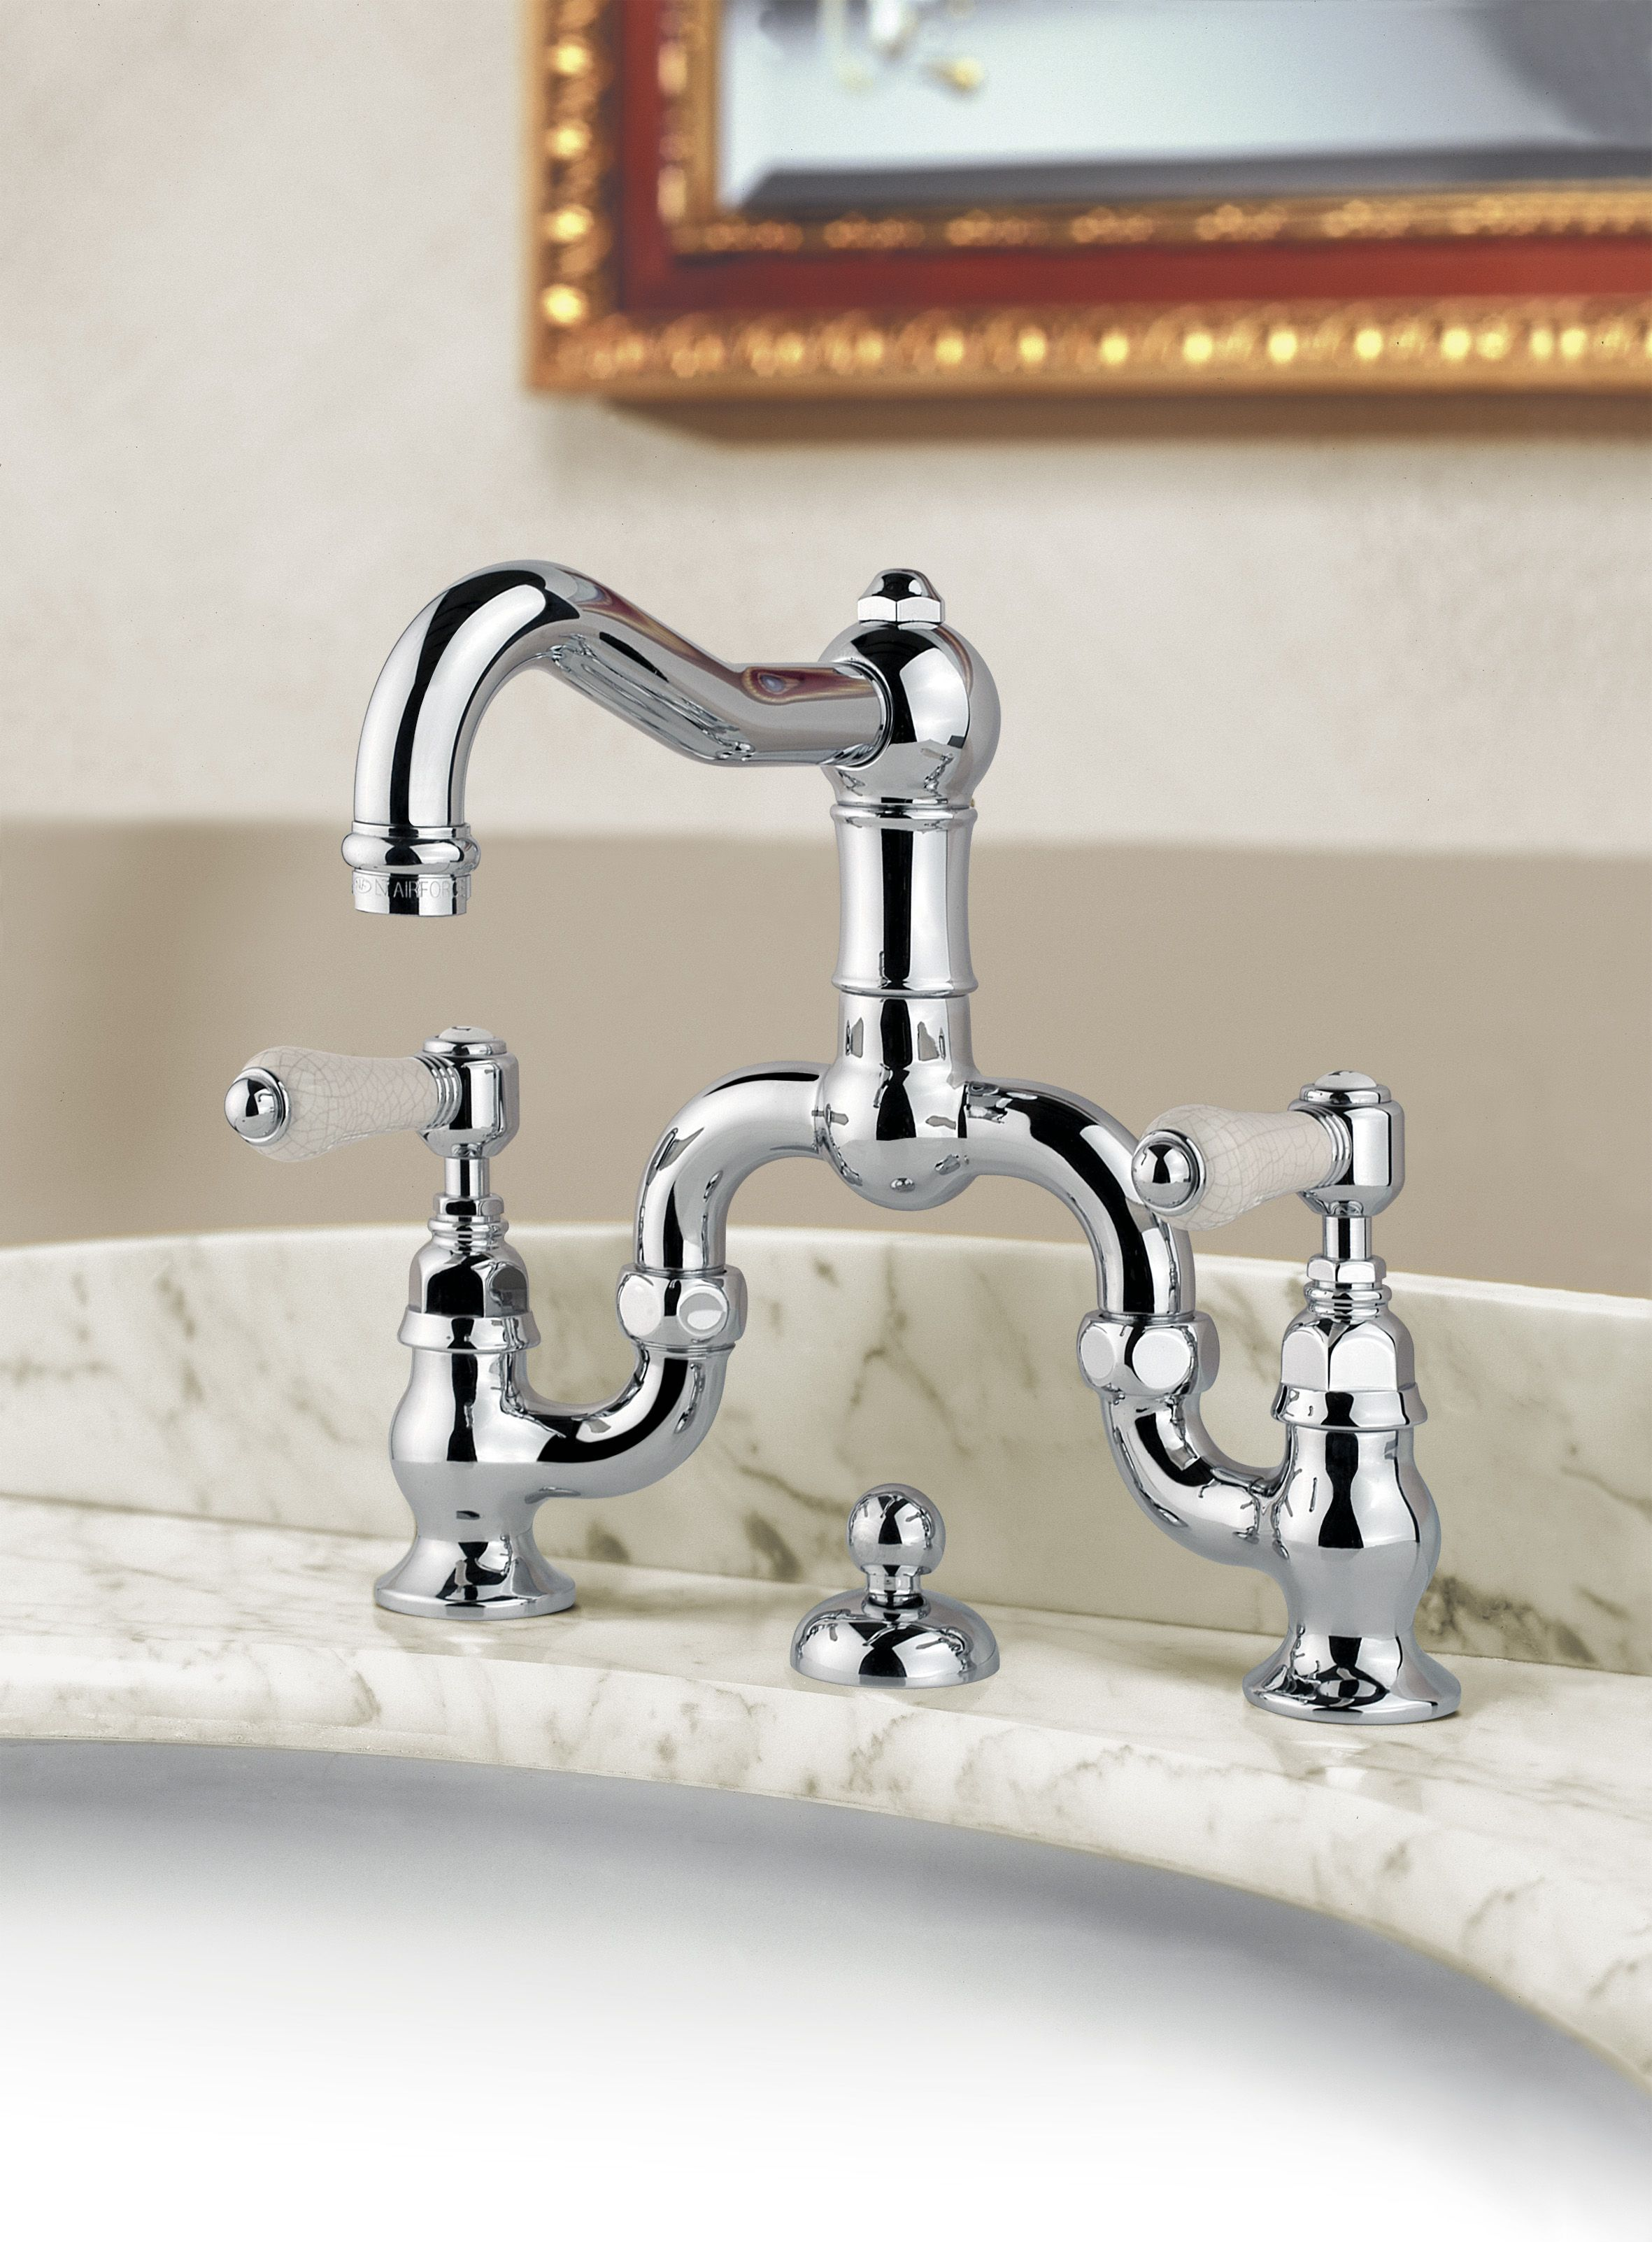 1419 - Bridge Faucet www.sinkandtap.com.au | Nicolazzi Bathroom ...